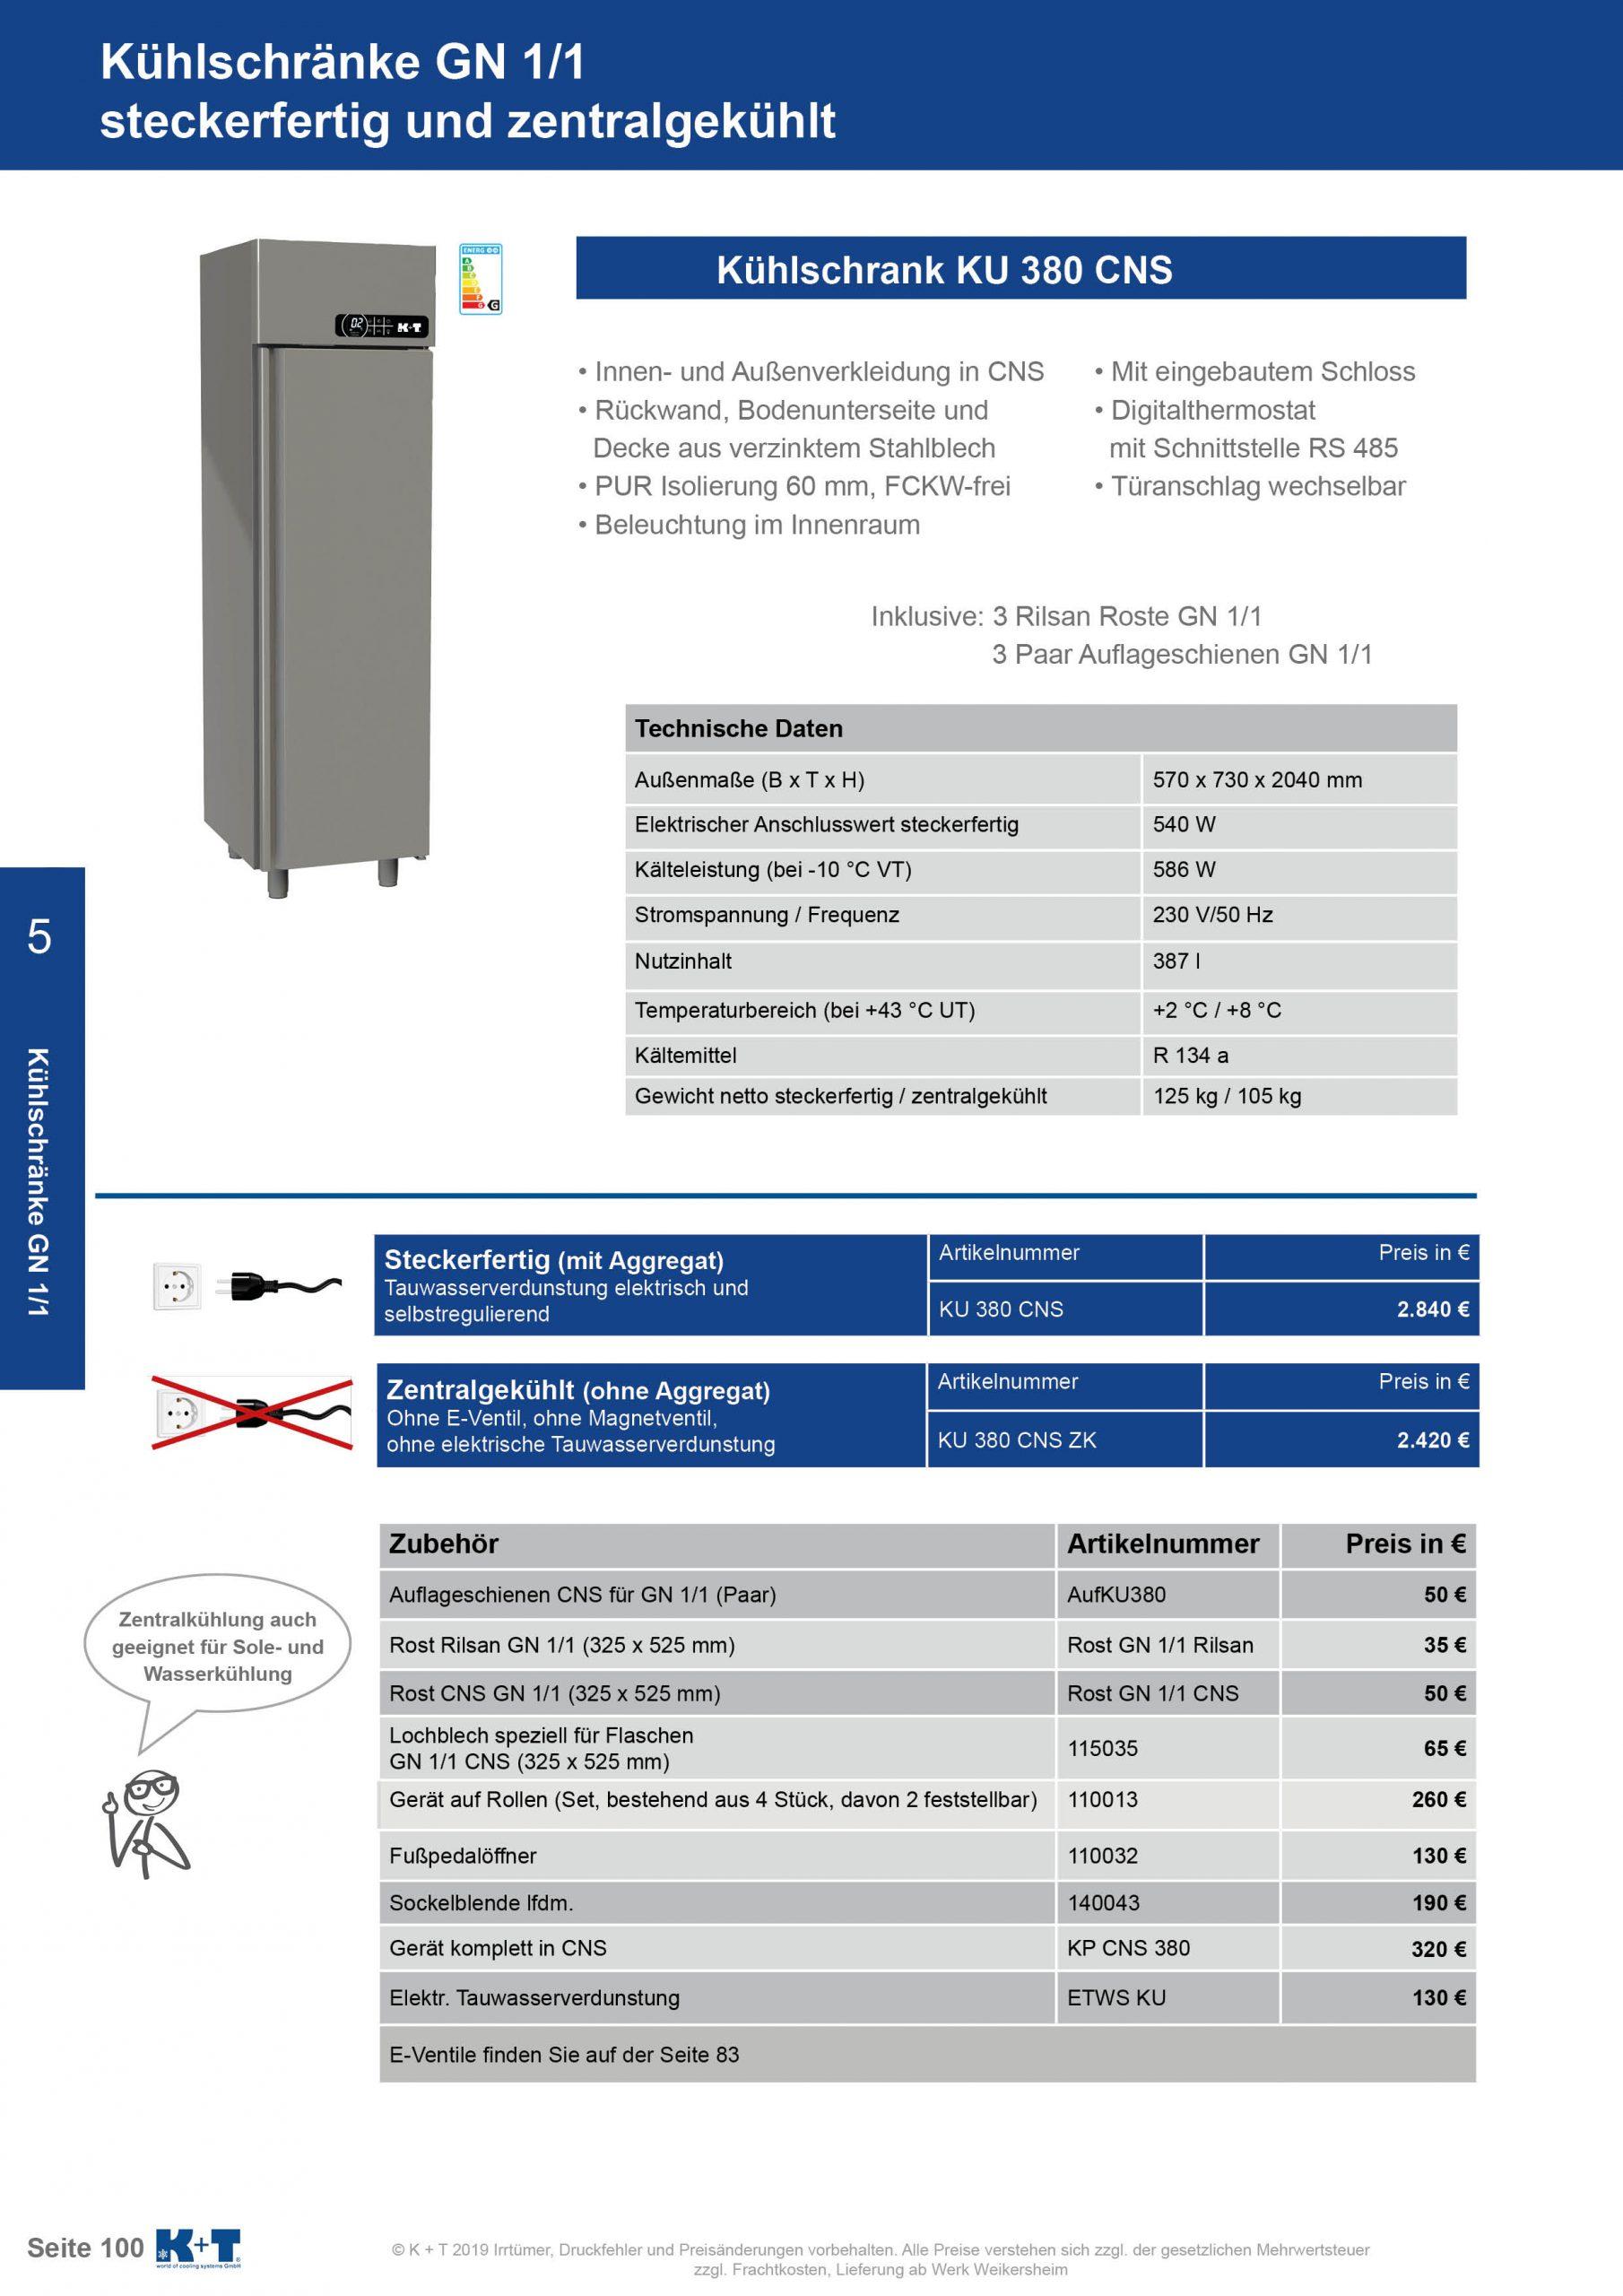 Kühlschränke GN 1_1 Kühlschrank zentralgekühlt